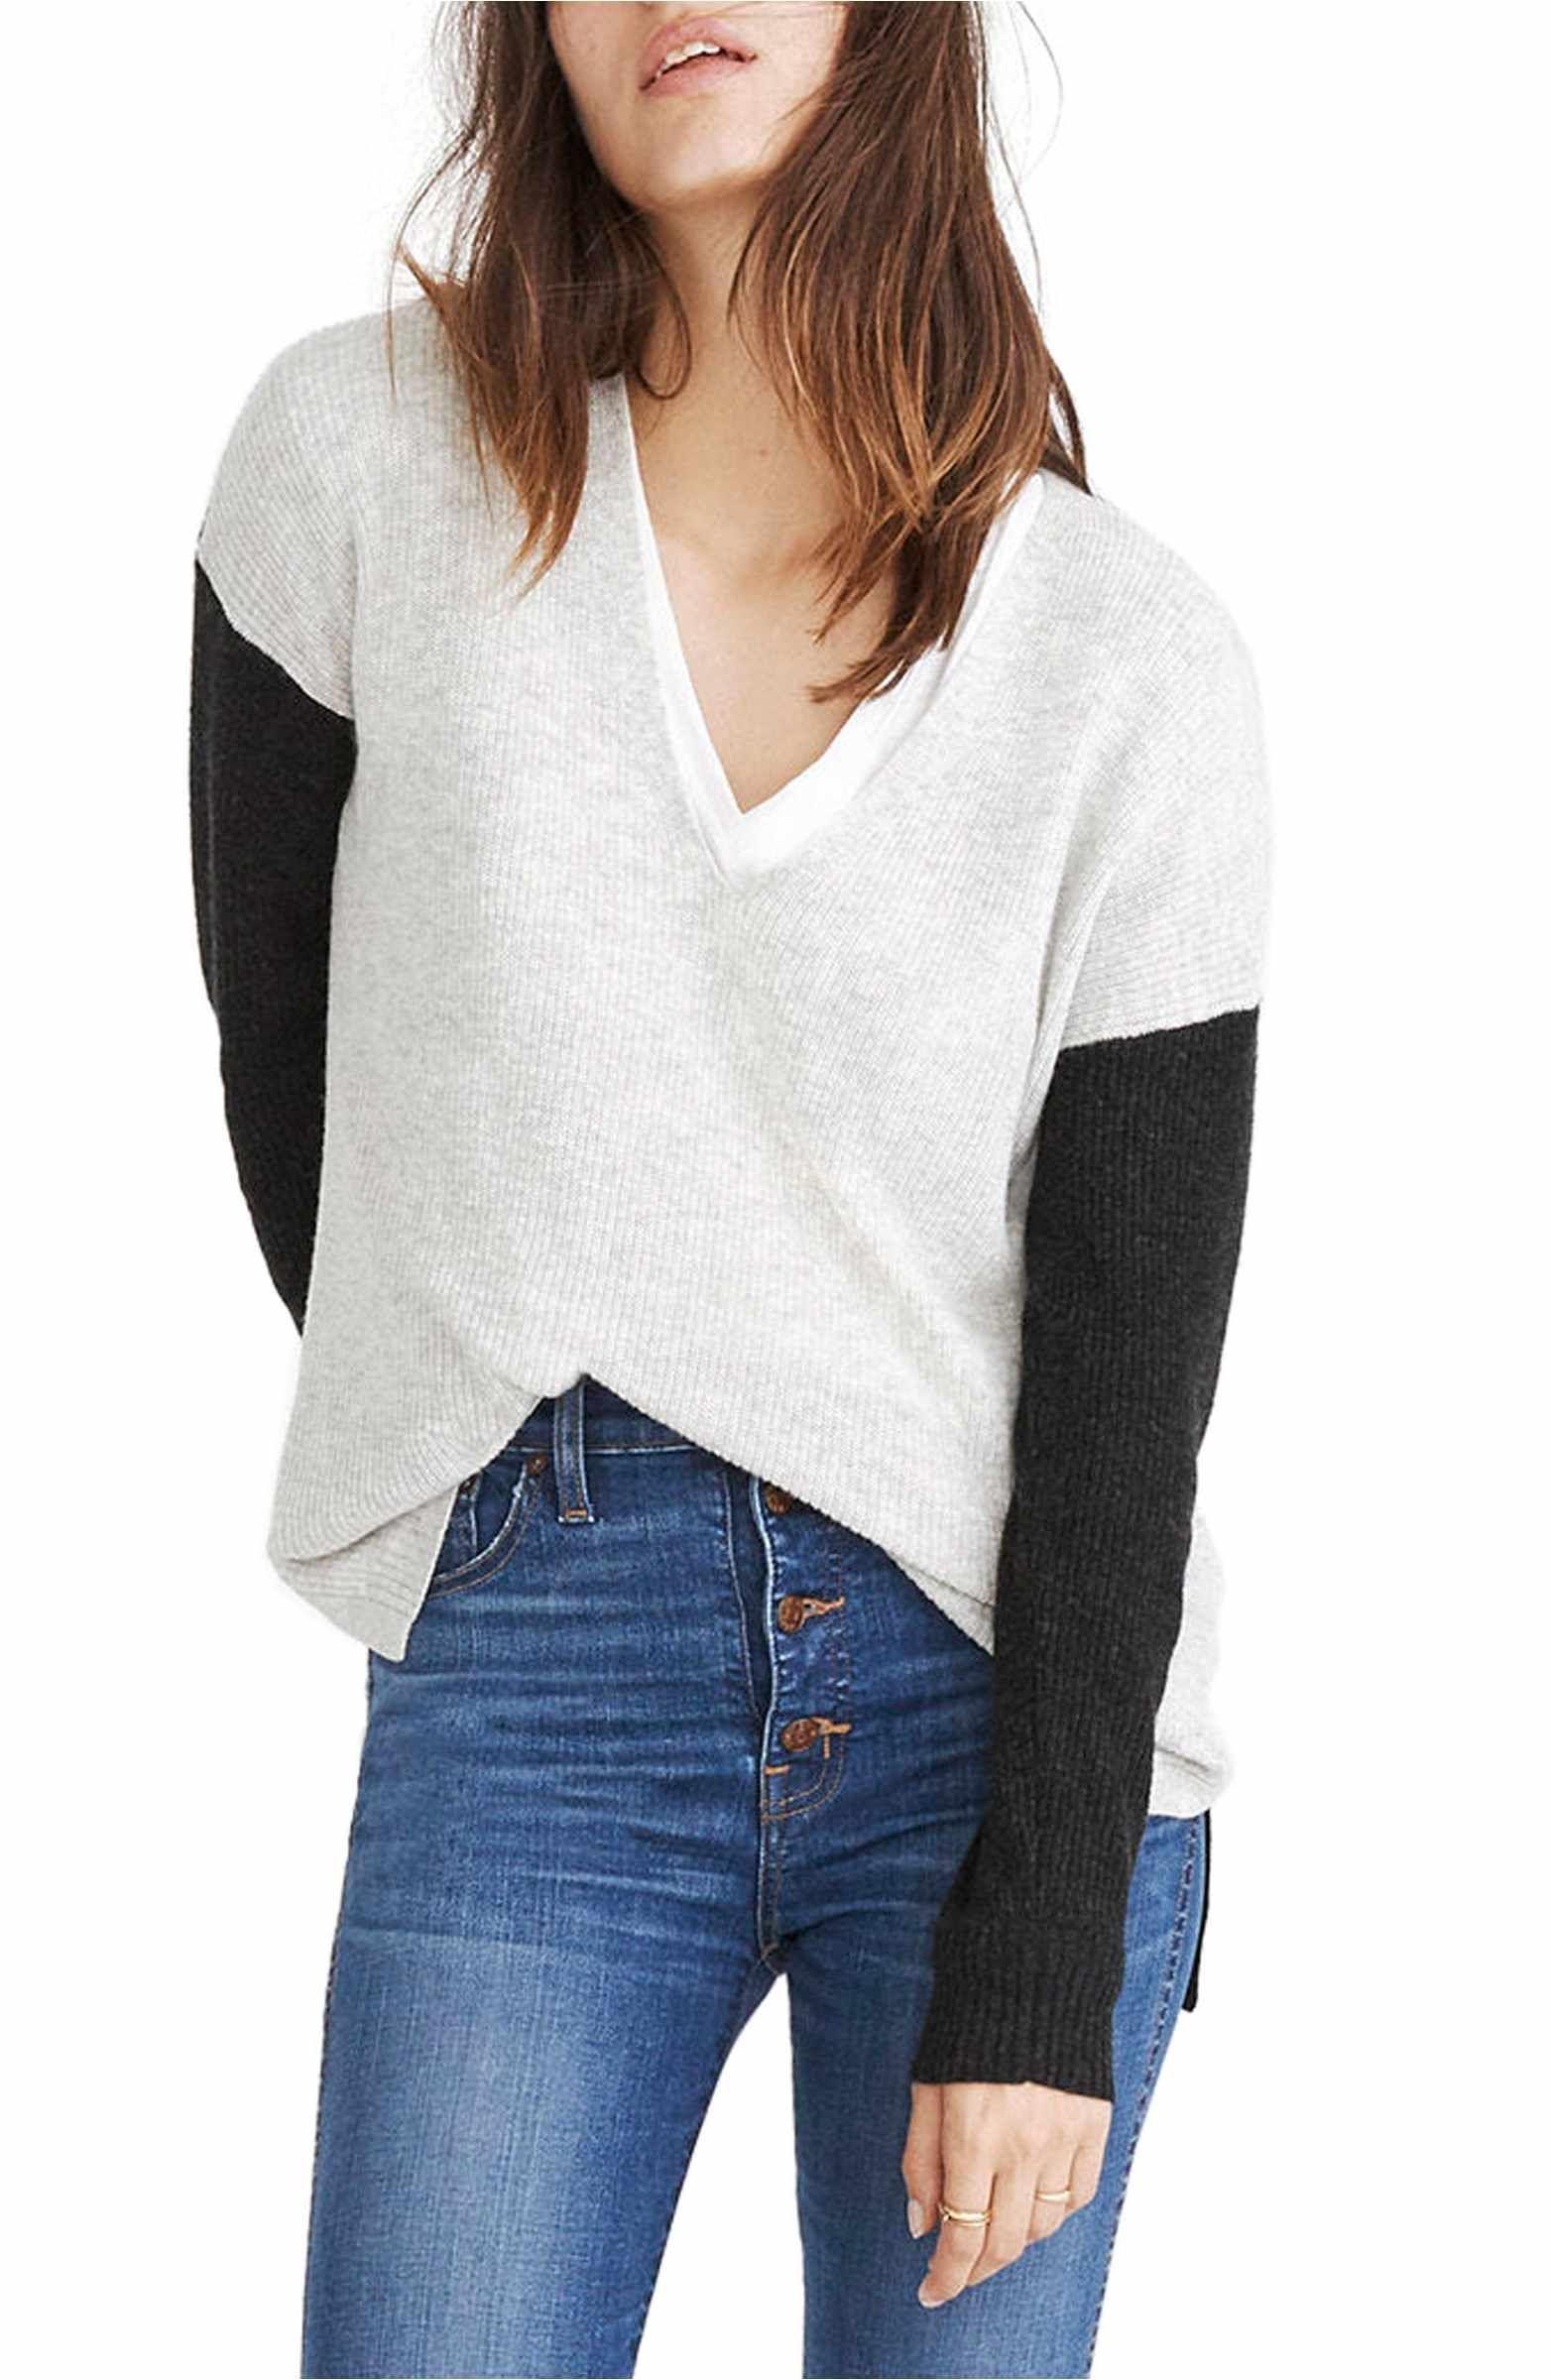 58320f4059 Main Image - Madewell Warmlight Colorblock V-Neck Sweater